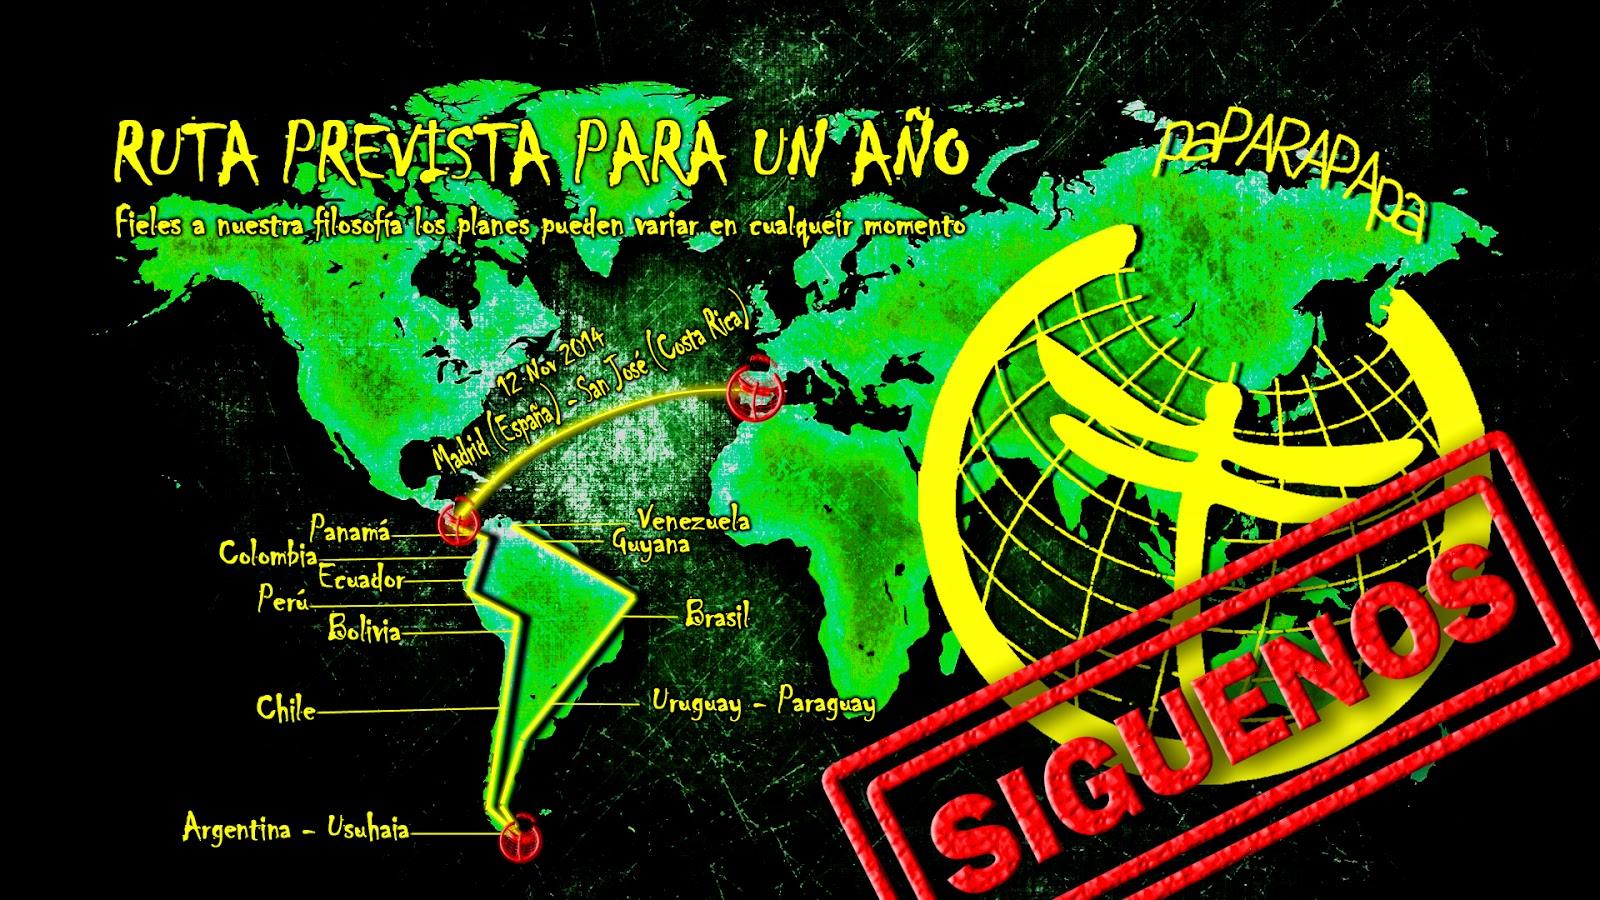 Ruta PAPARAPAPA para mochileros por Sudamérica